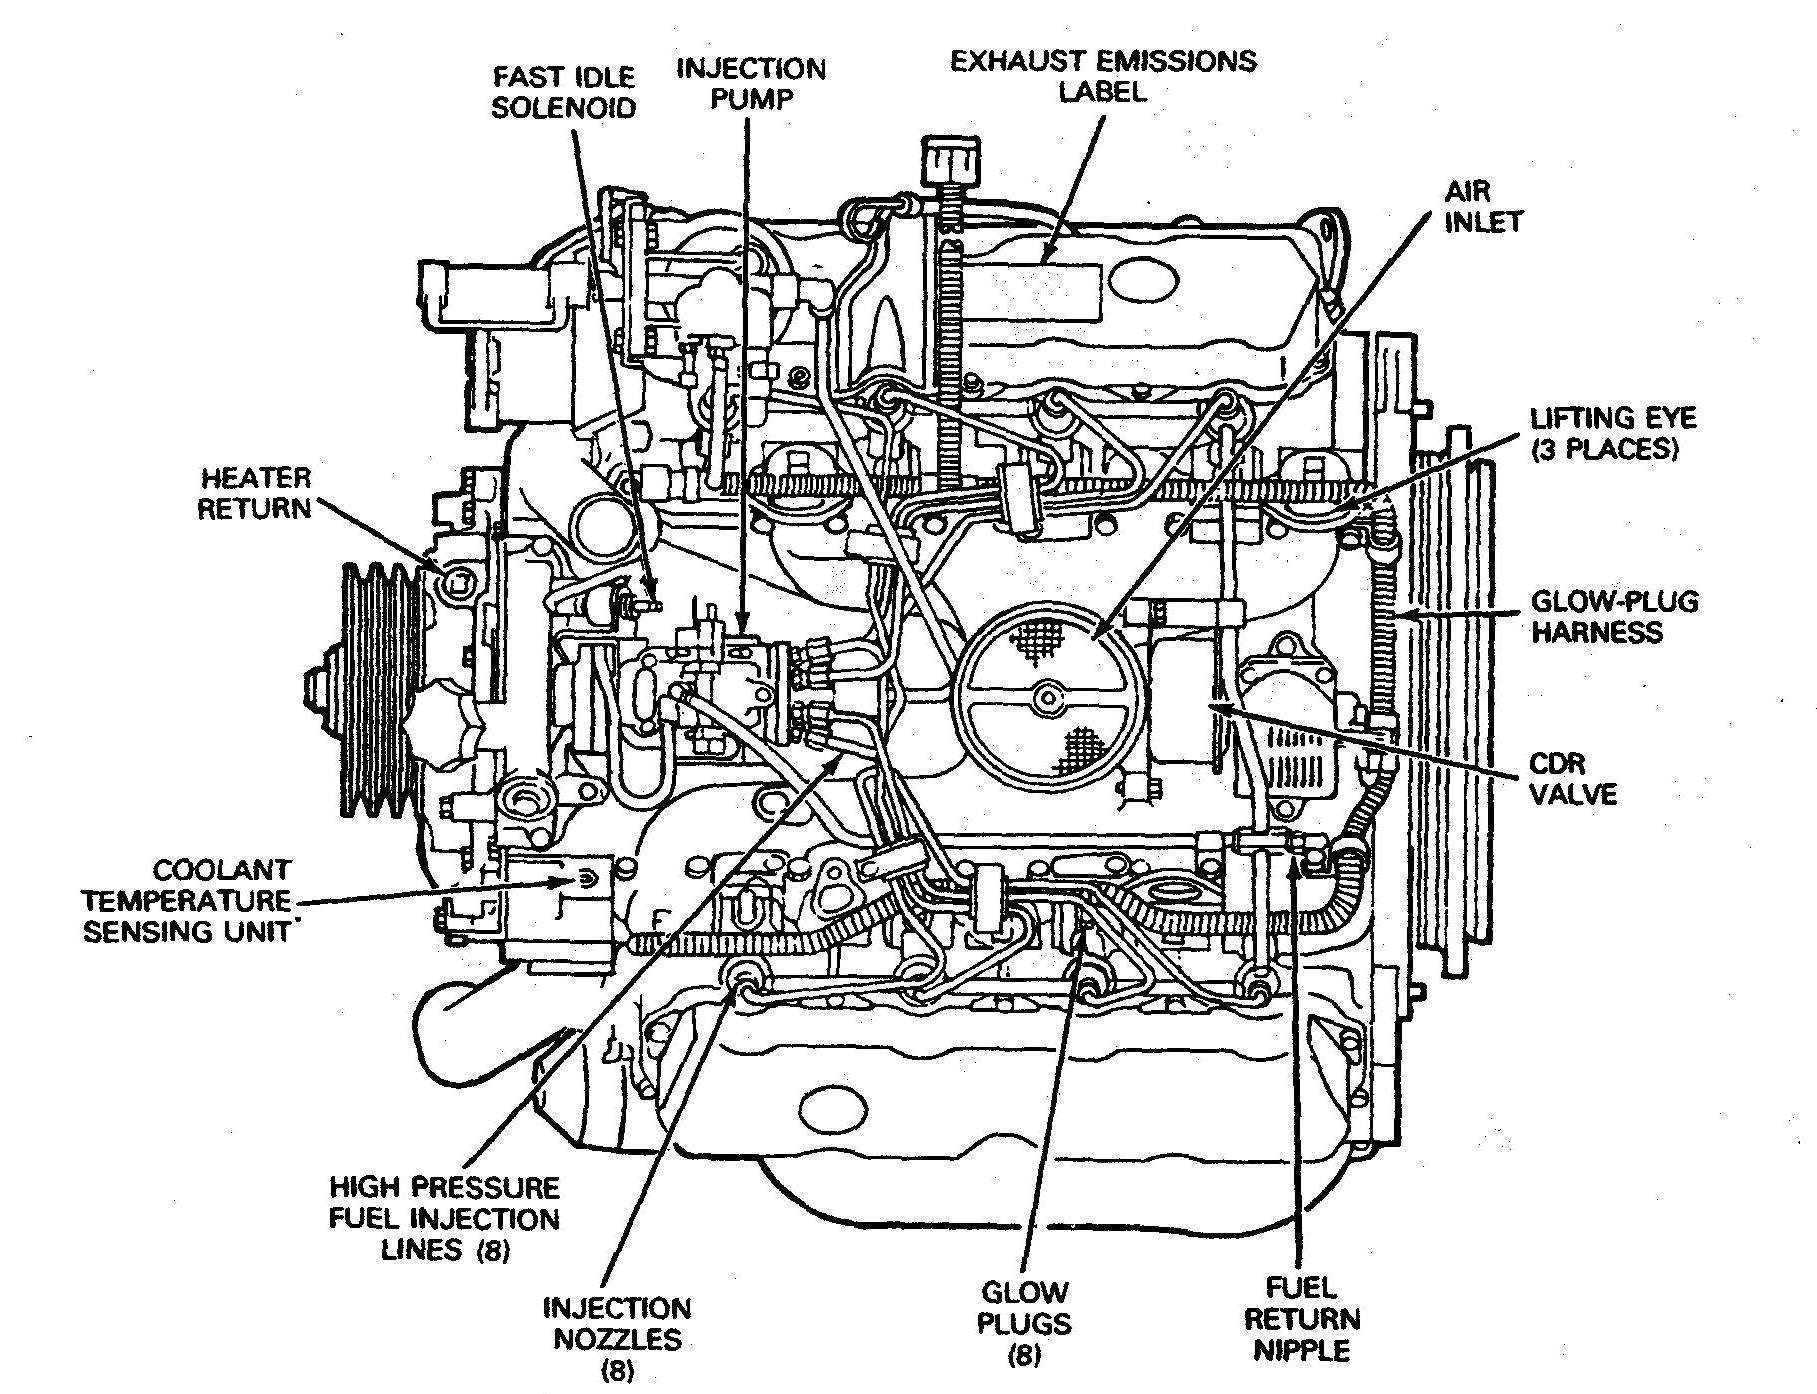 Diesel Engine Diagram Labeled Engine Diagram Labeled Car